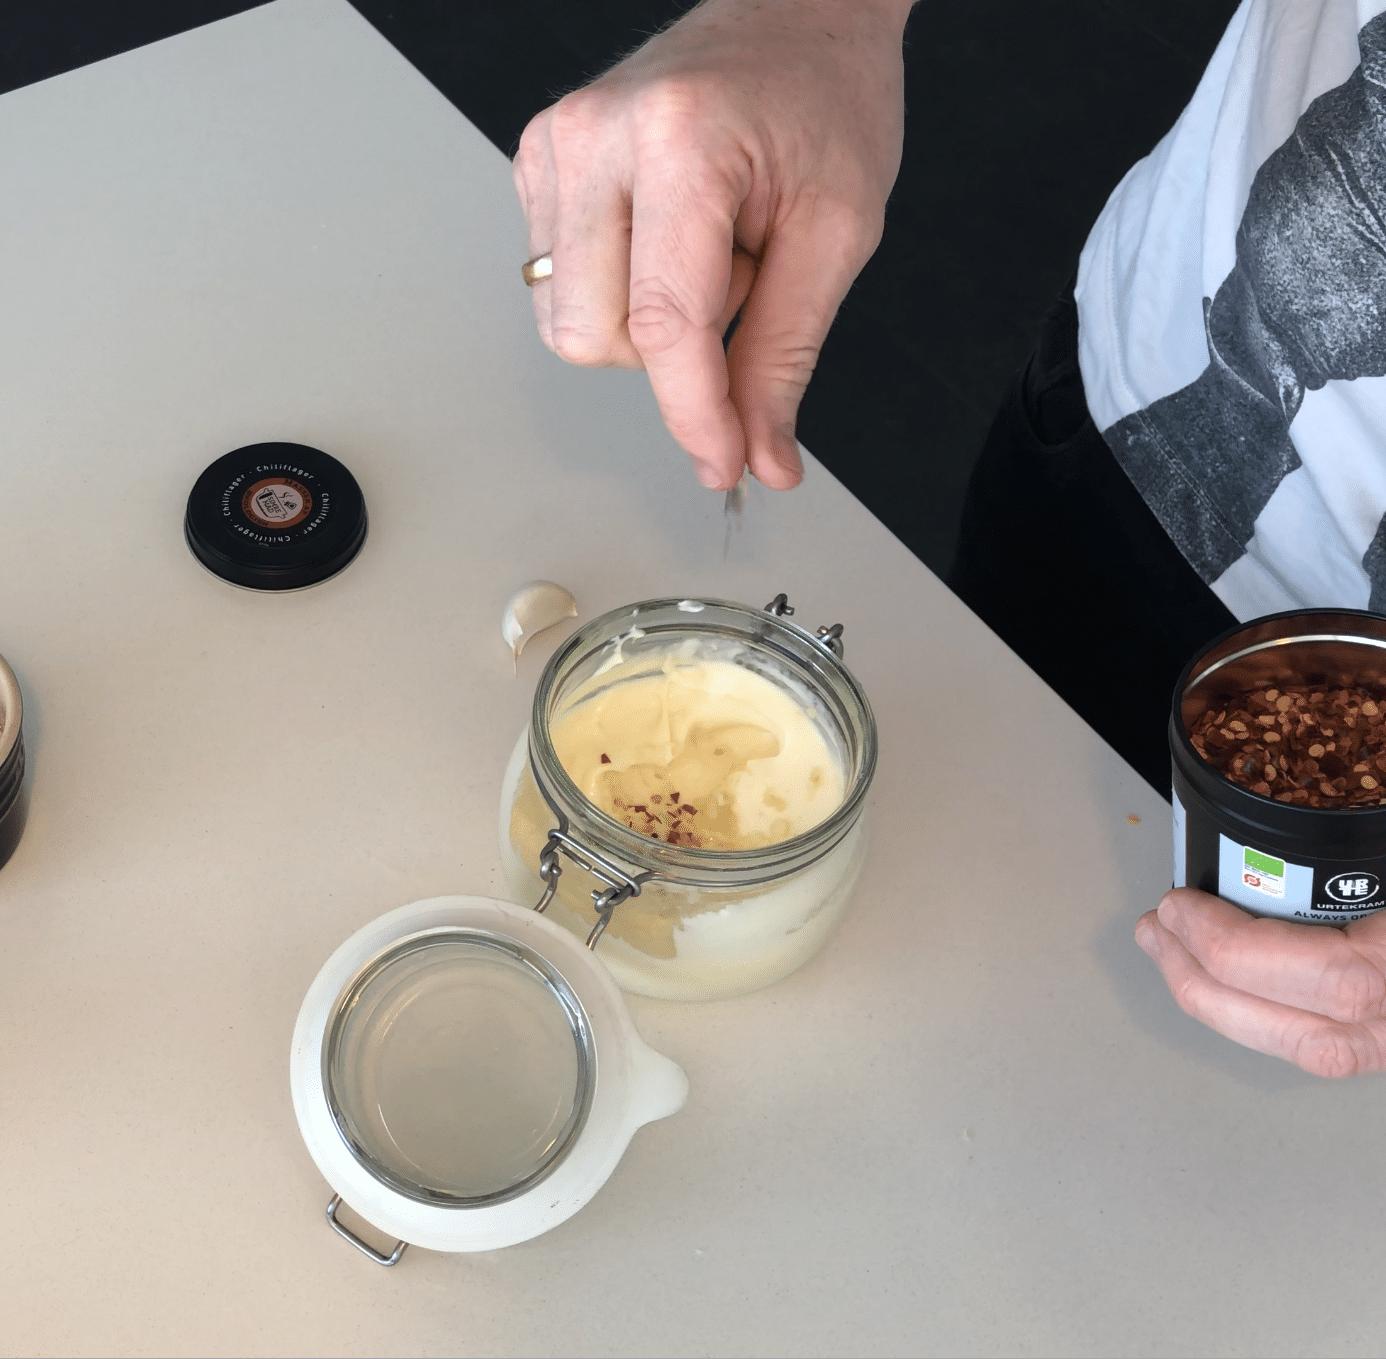 Hvidløg og chili tilsættes enten fra start, eller når du har lavet mayonnaisen hjemmelavet aioli opskrift